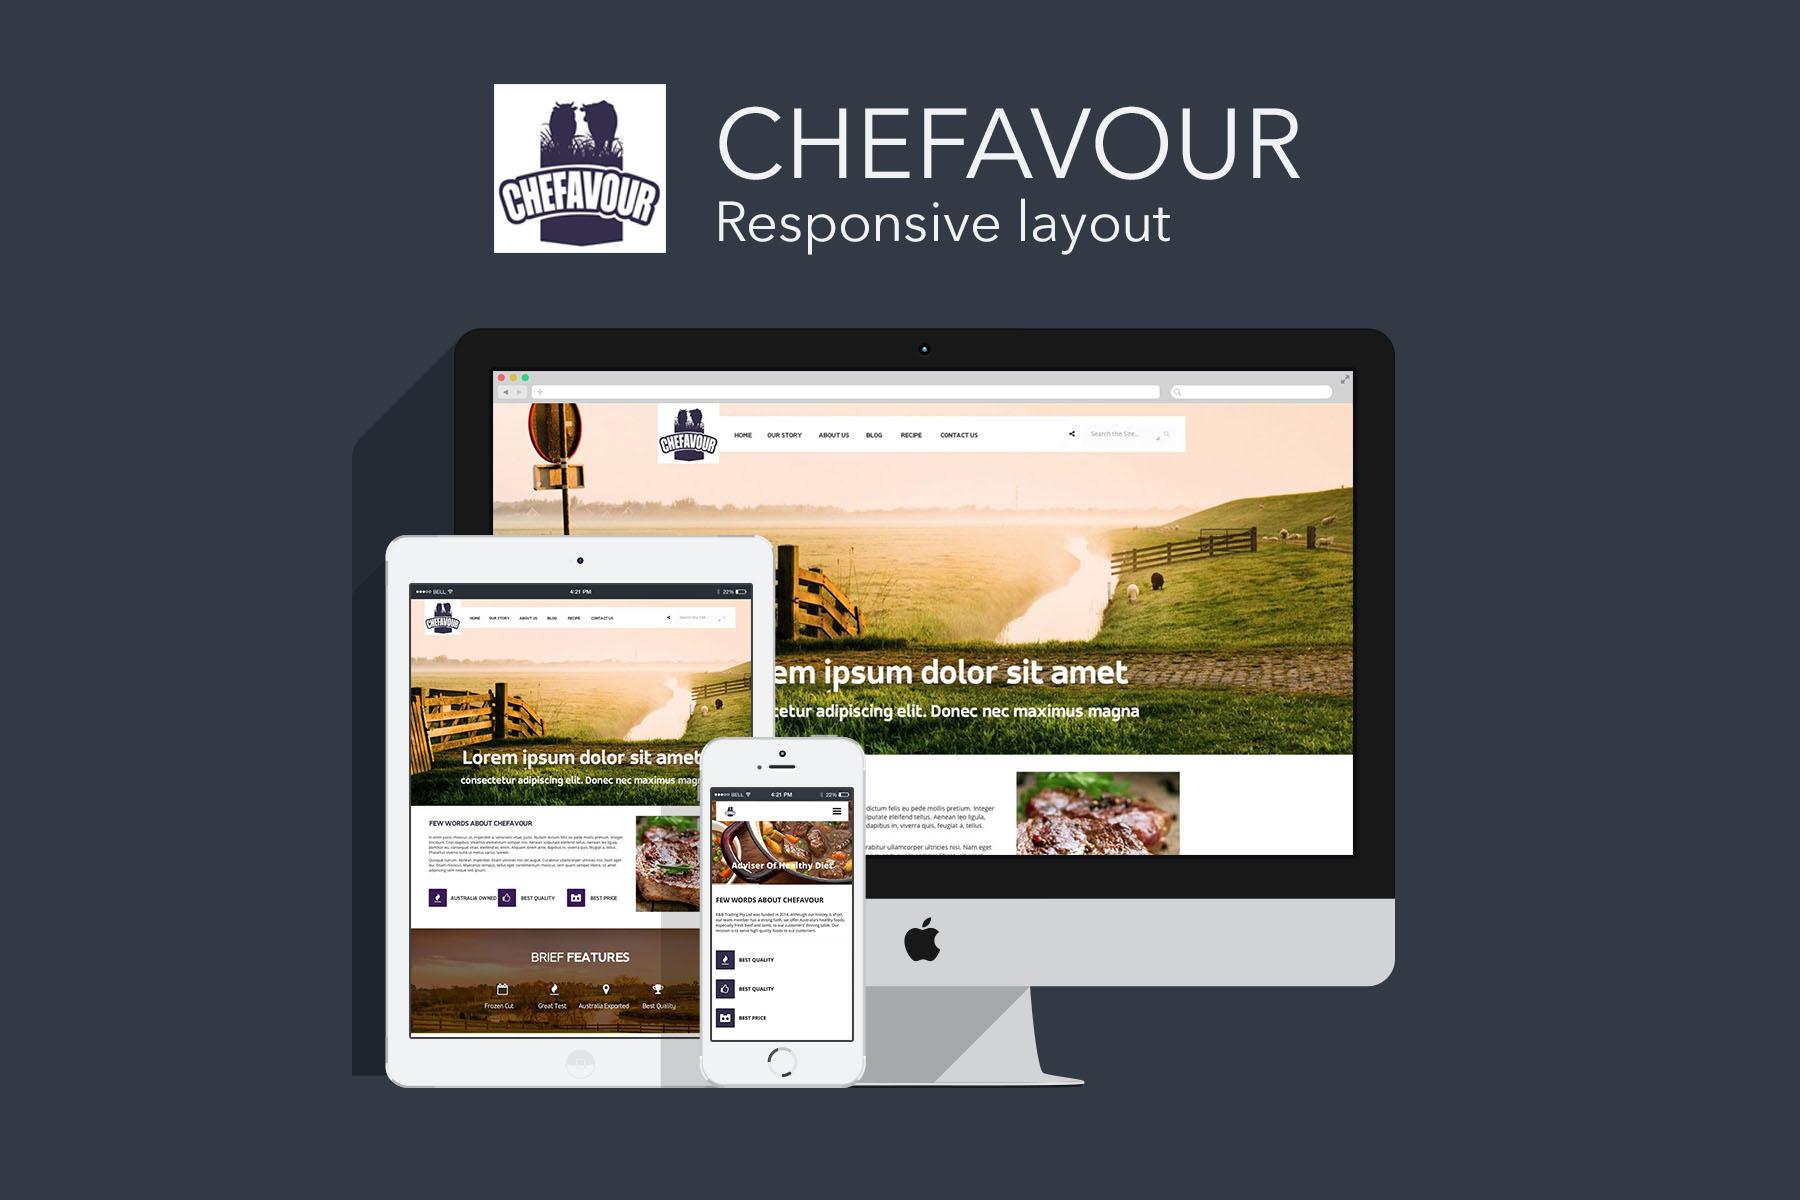 Website Design and Development -- Chefavour